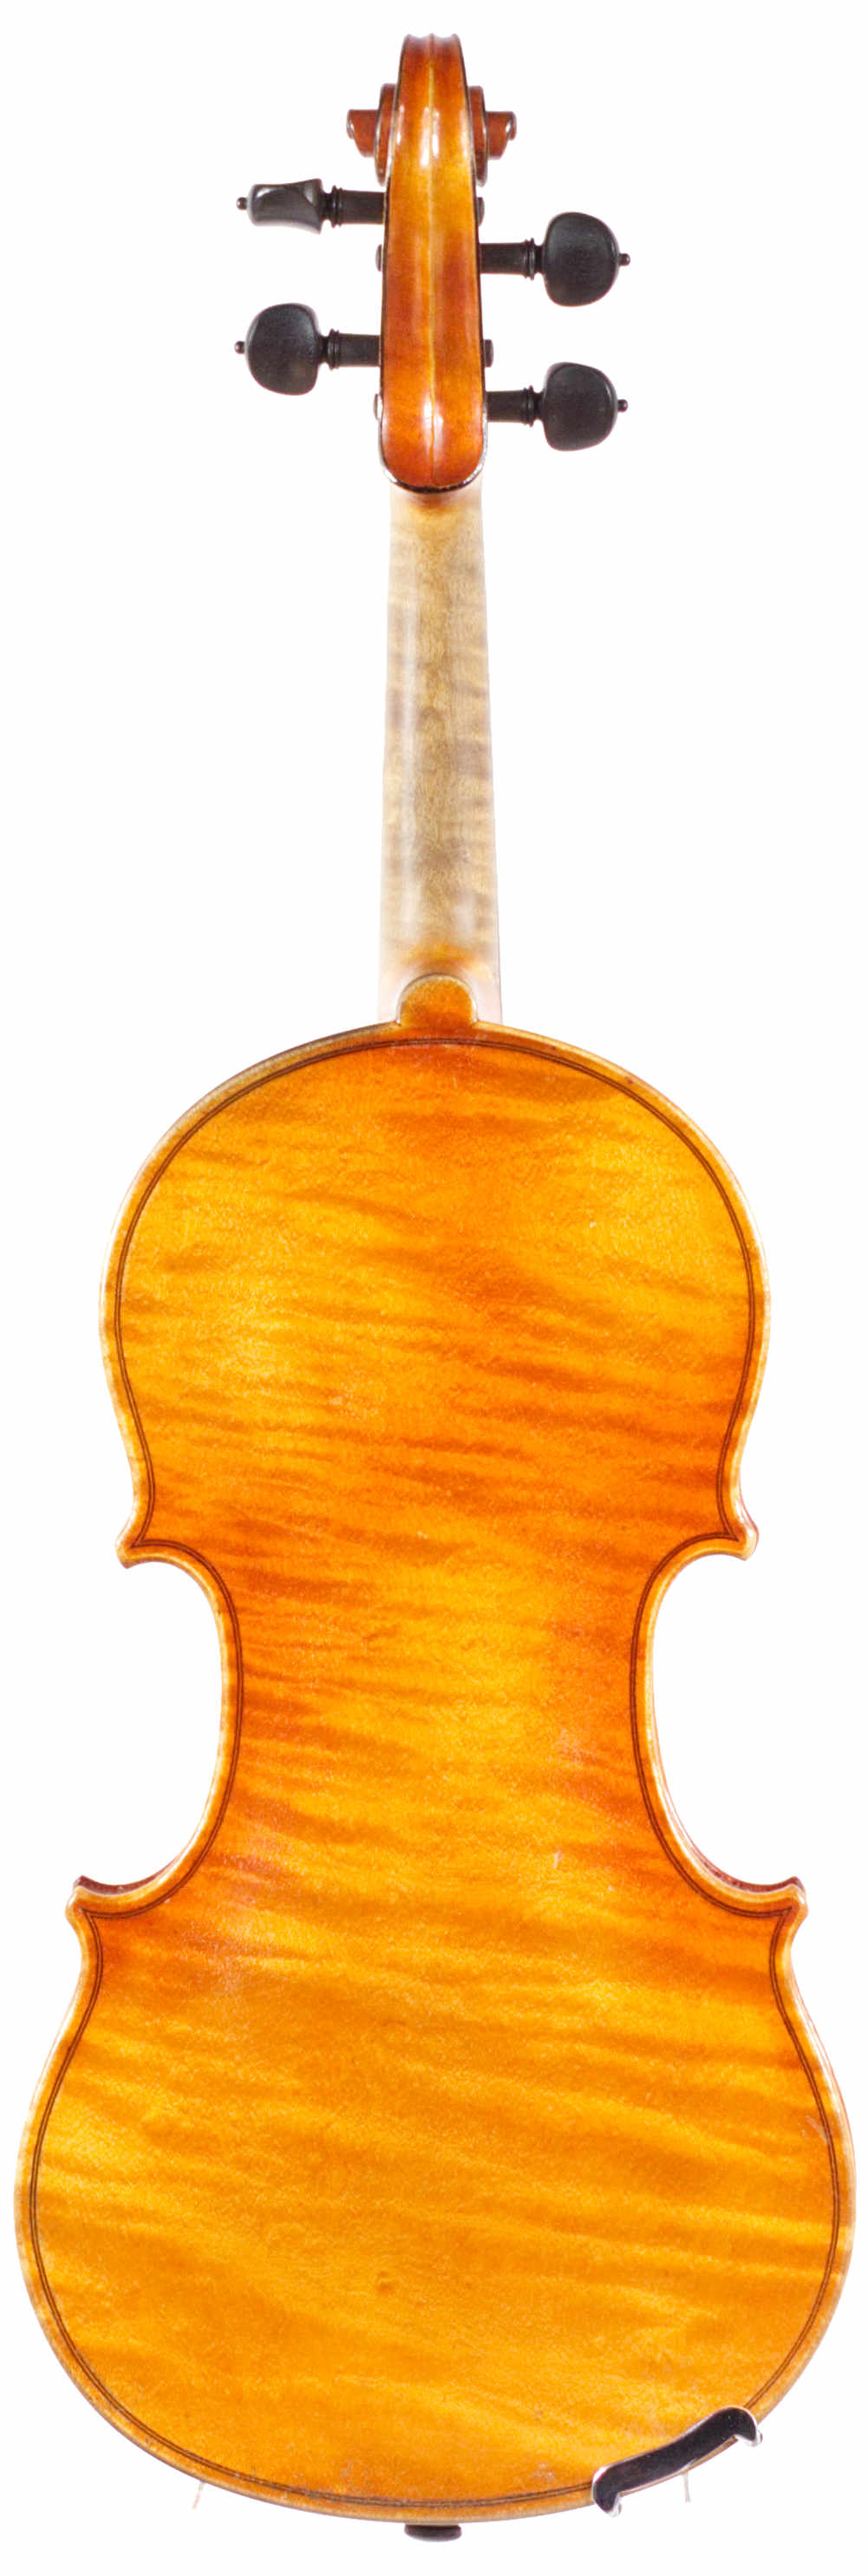 Harwood violin